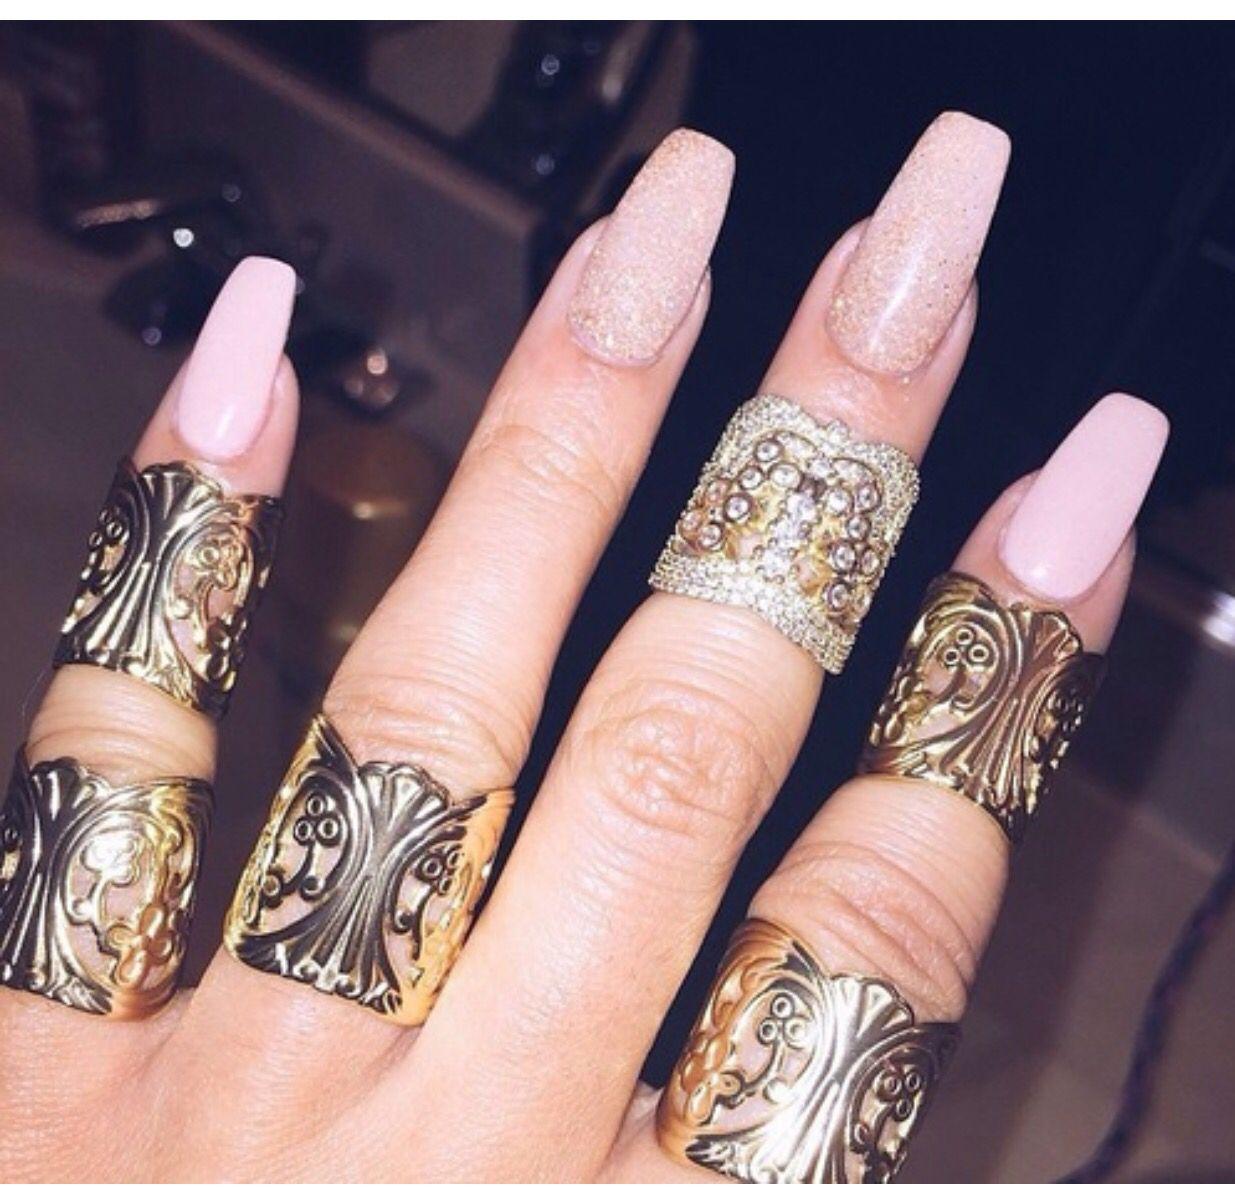 Nails jewels